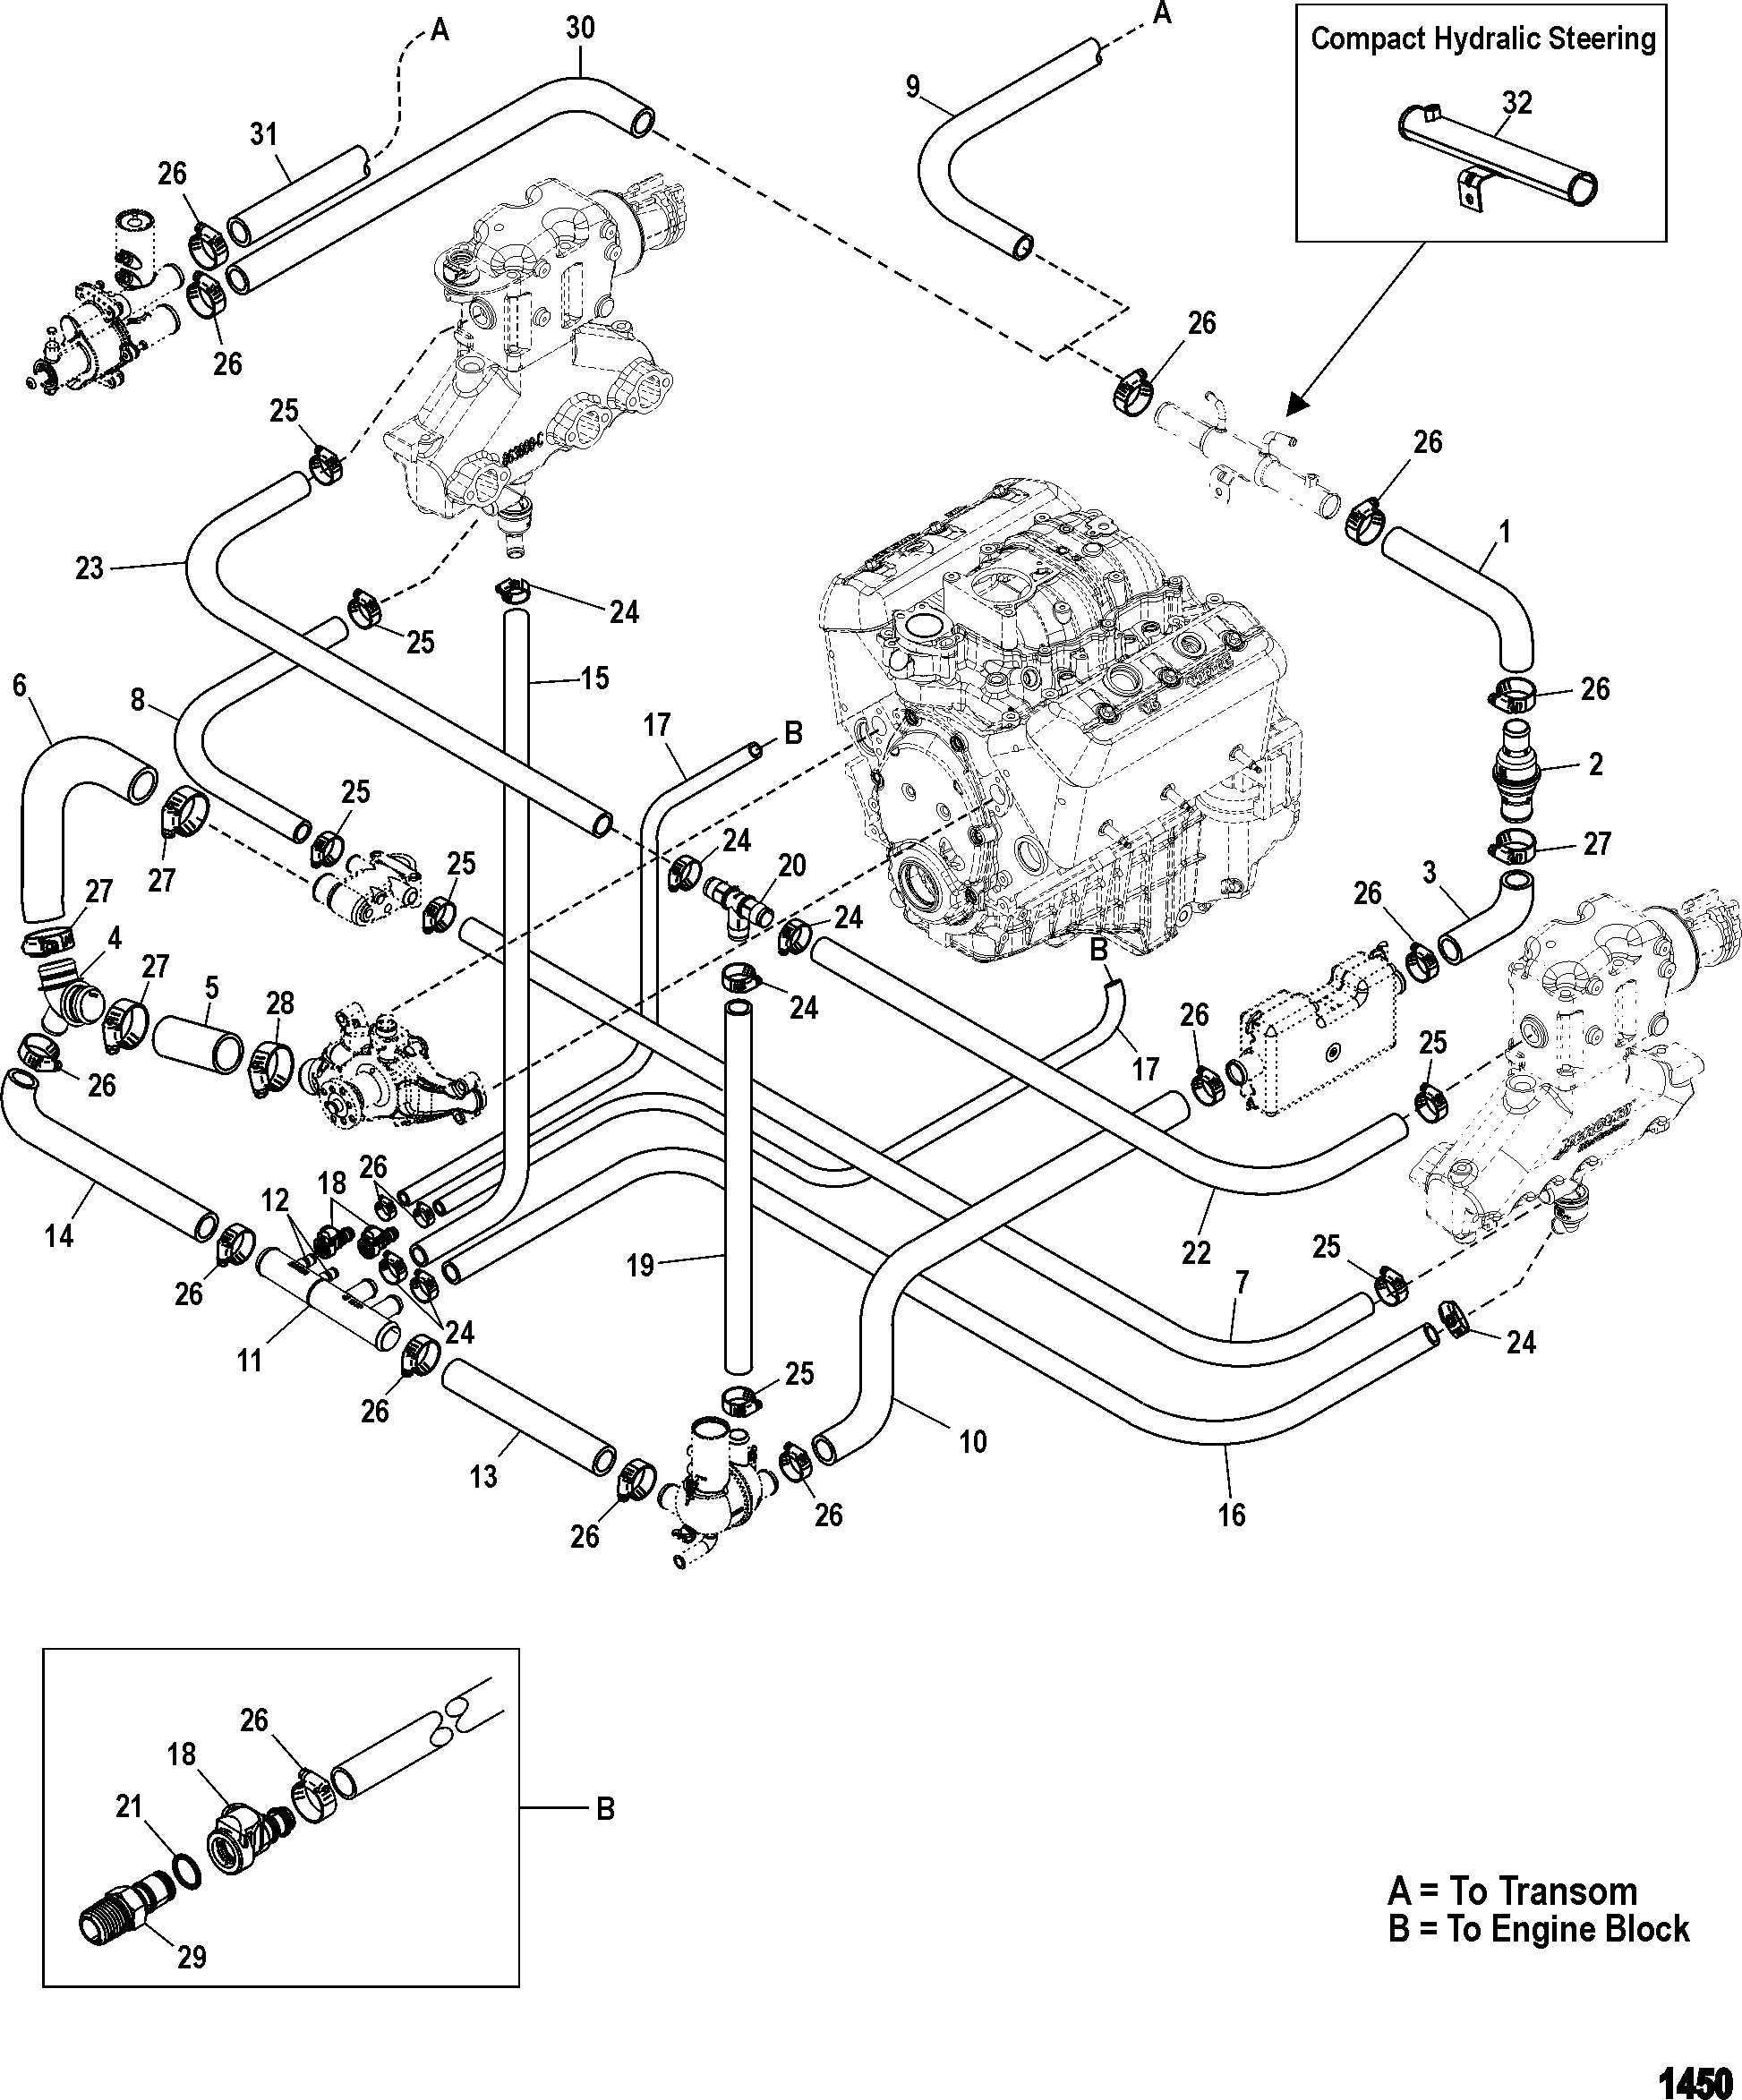 hv_2568] silverado 4 3 engine diagram  anth over jebrp mohammedshrine librar wiring 101